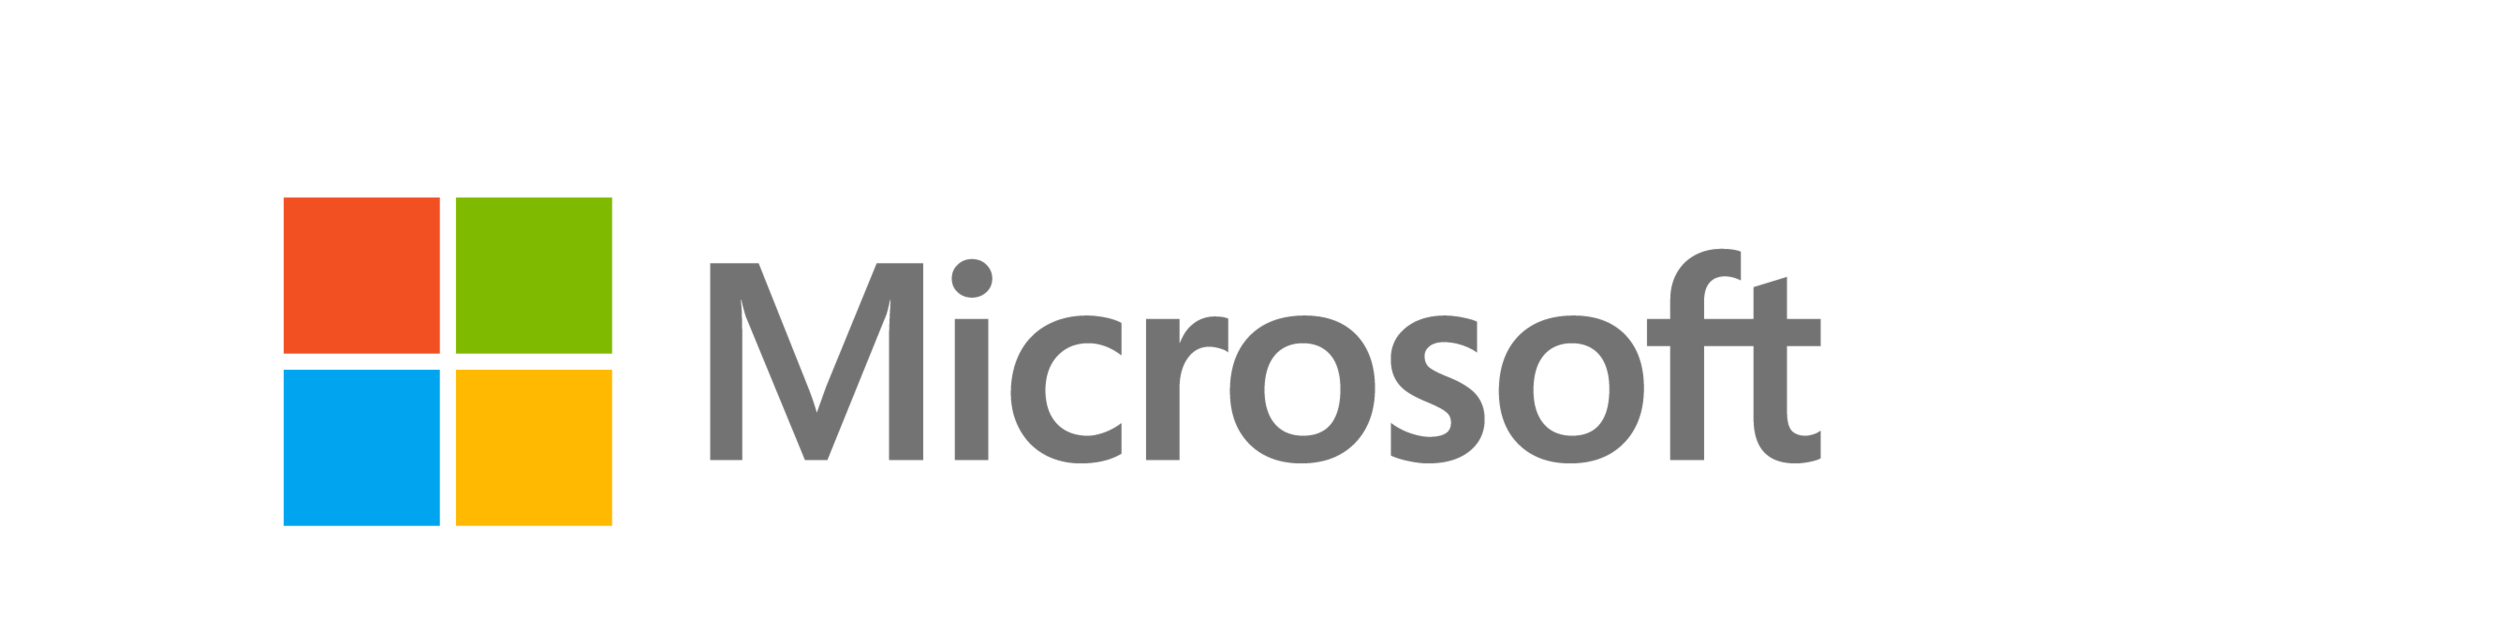 Microsoft-Logo-PNG_Pad.png